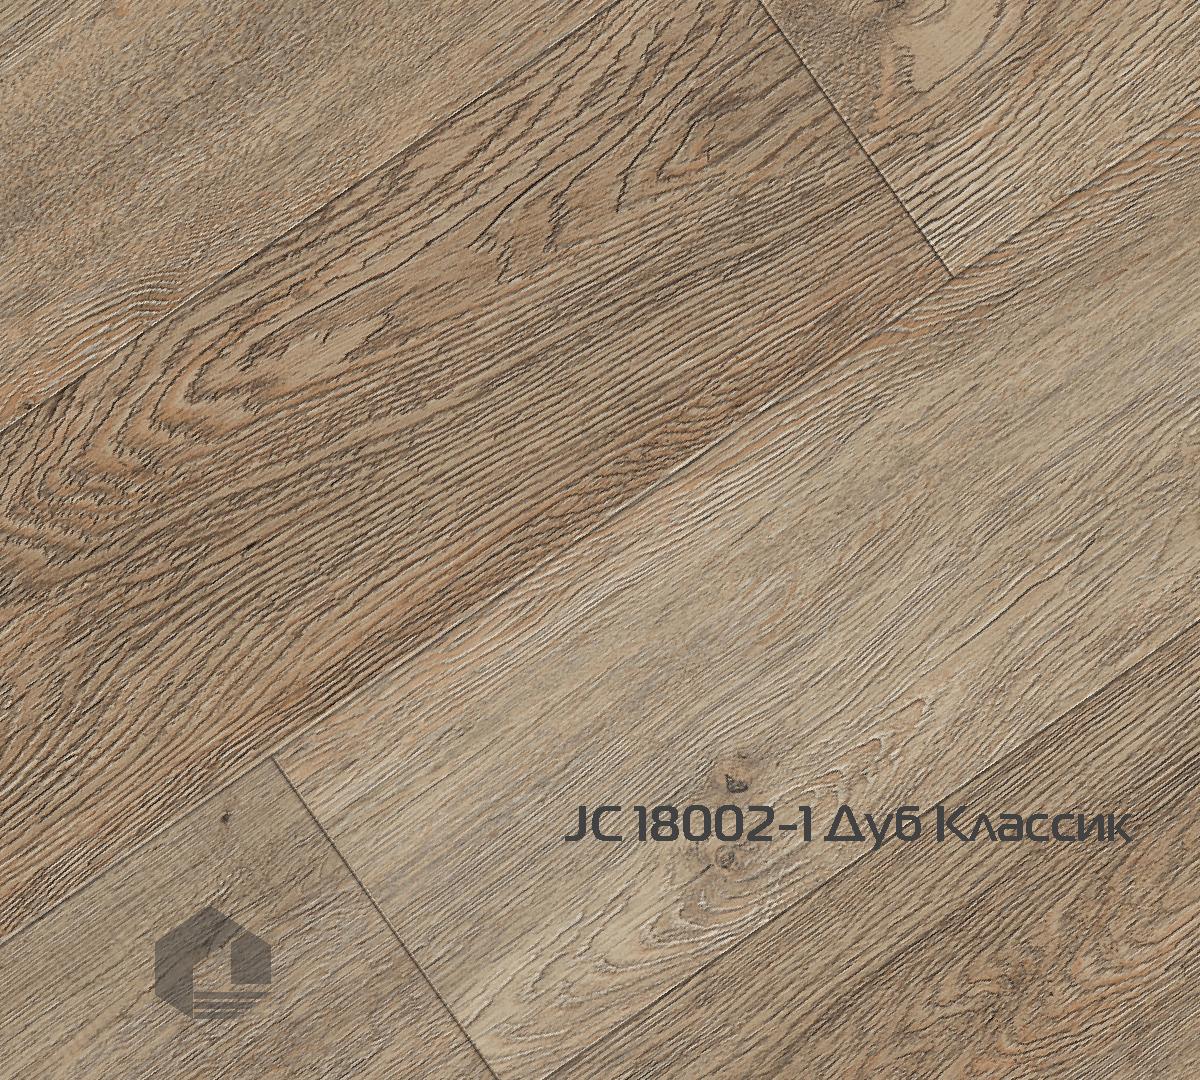 "Кварцевый ламинат SPC Fargo Comfort JC 18002-1 ""Дуб Классик"" (1220*180*4 мм) 10шт/2,196м2"